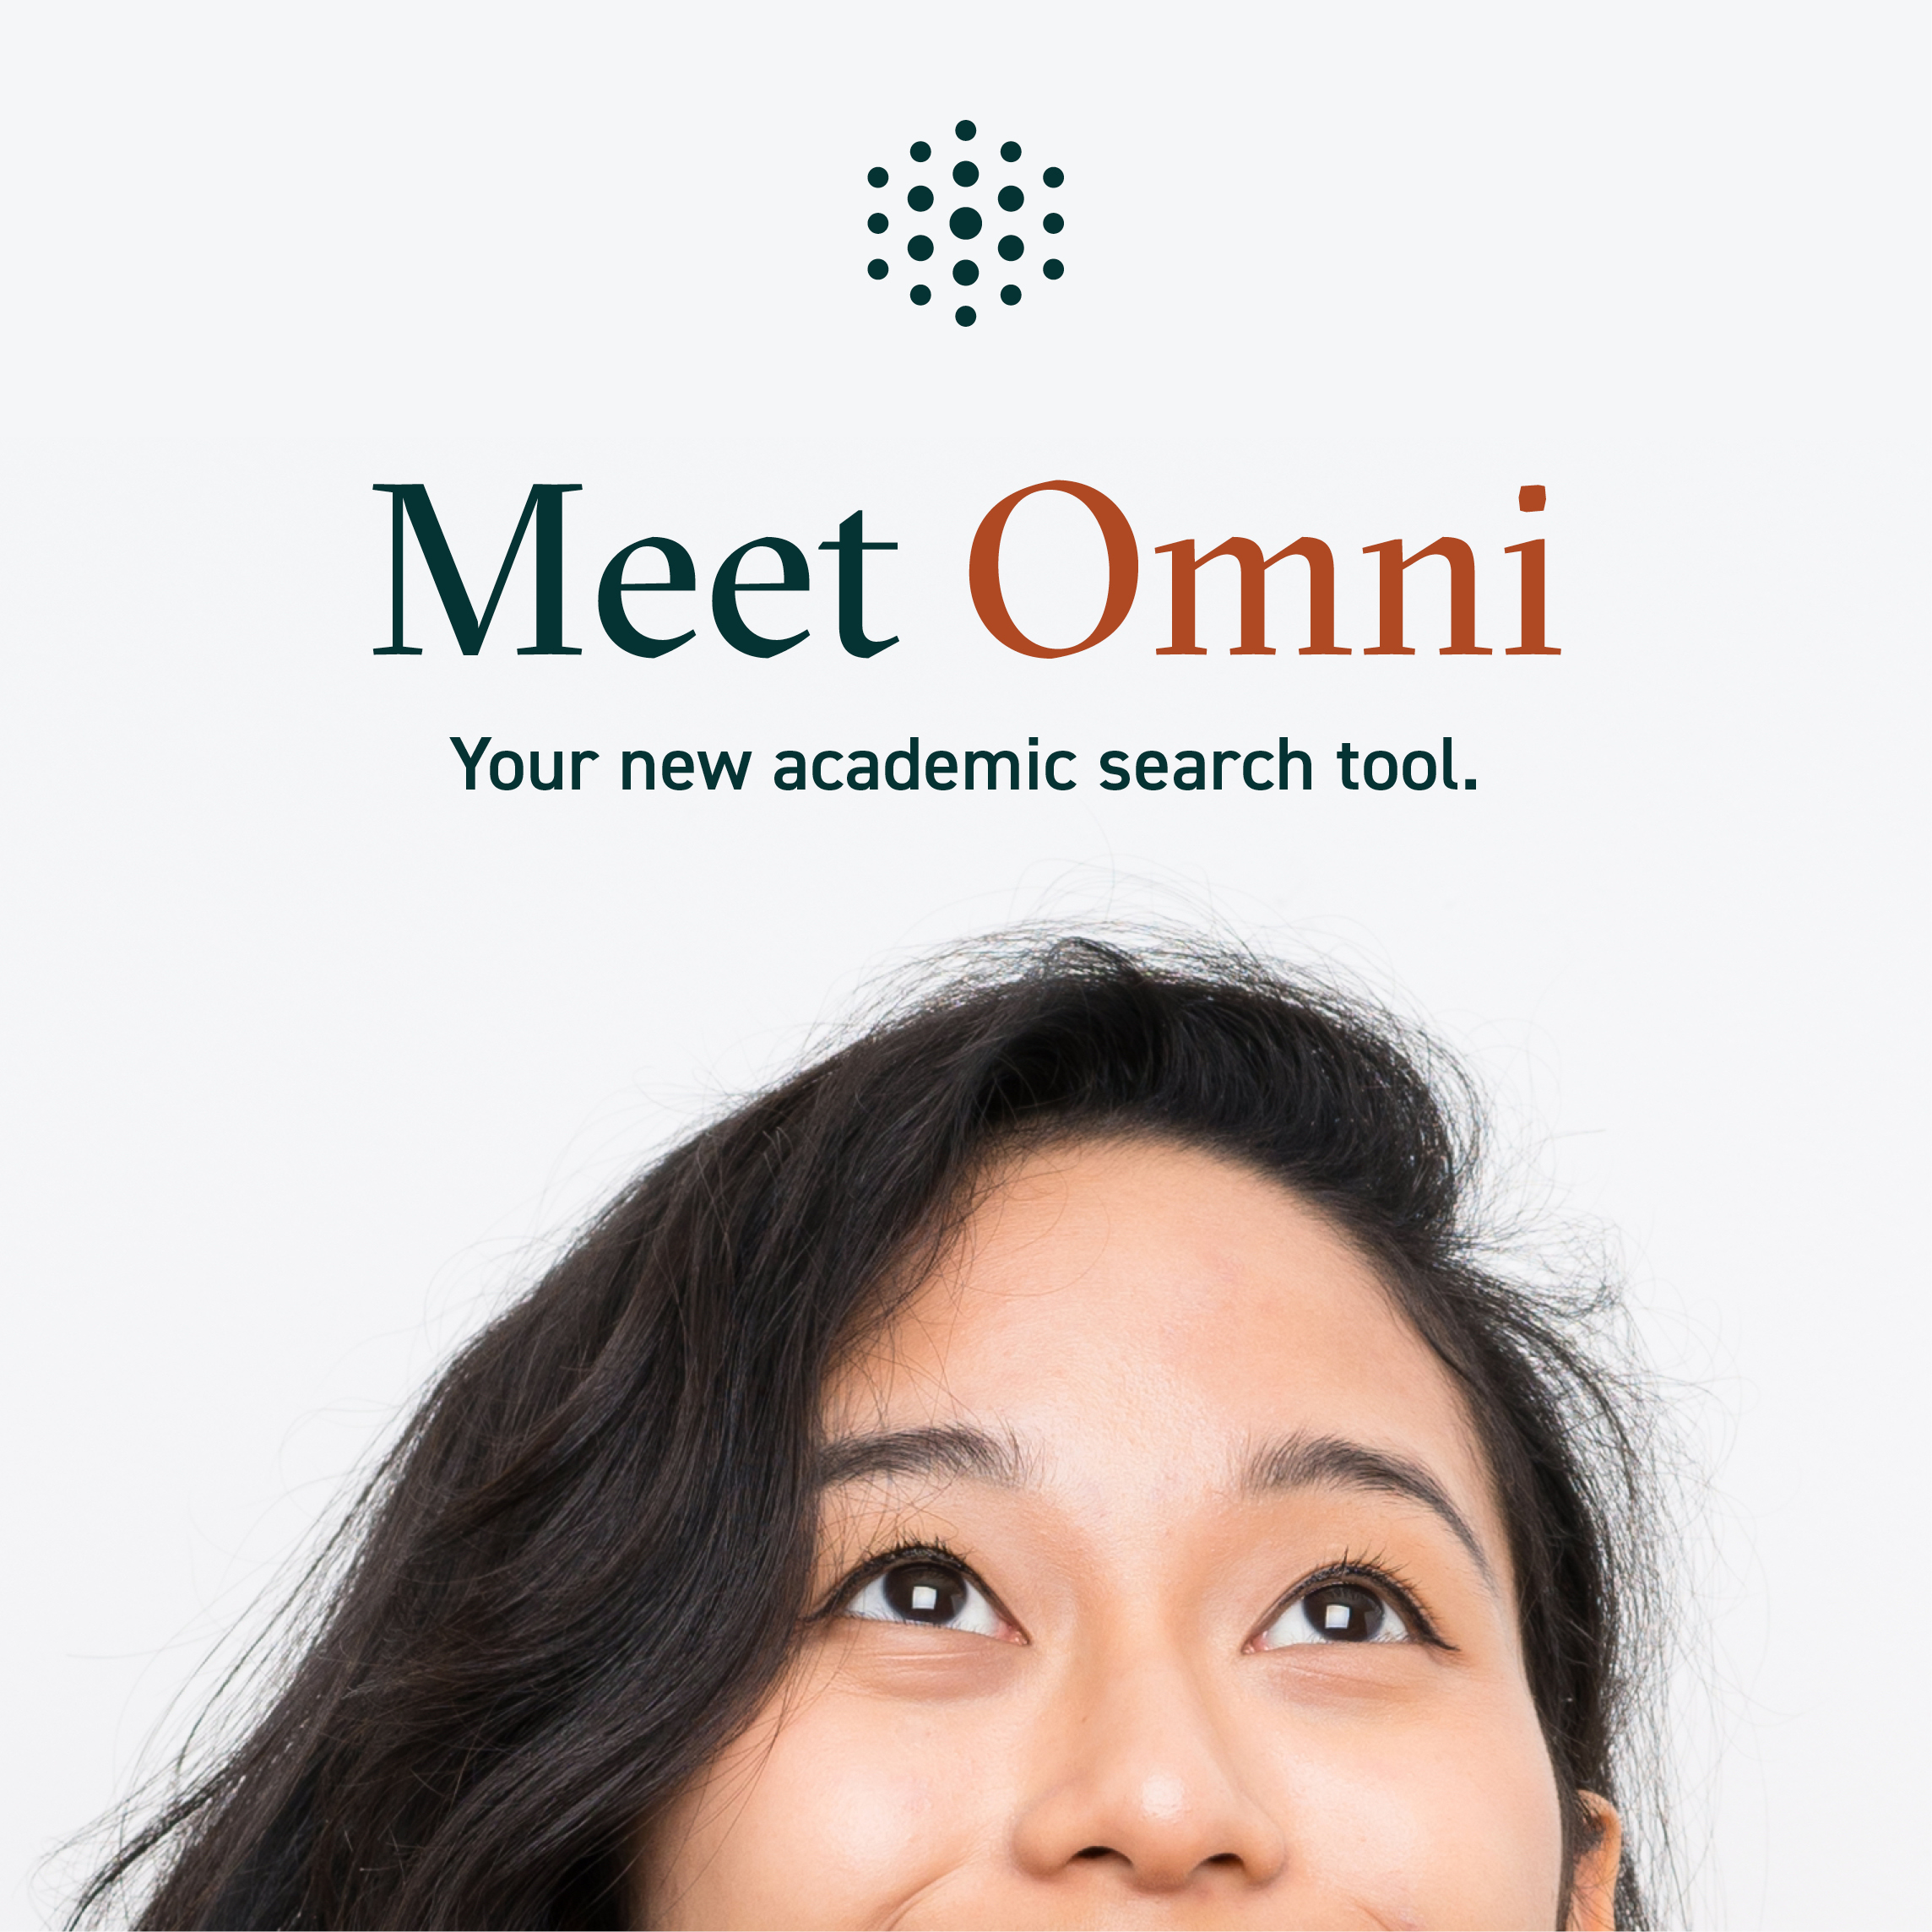 Meet Omni